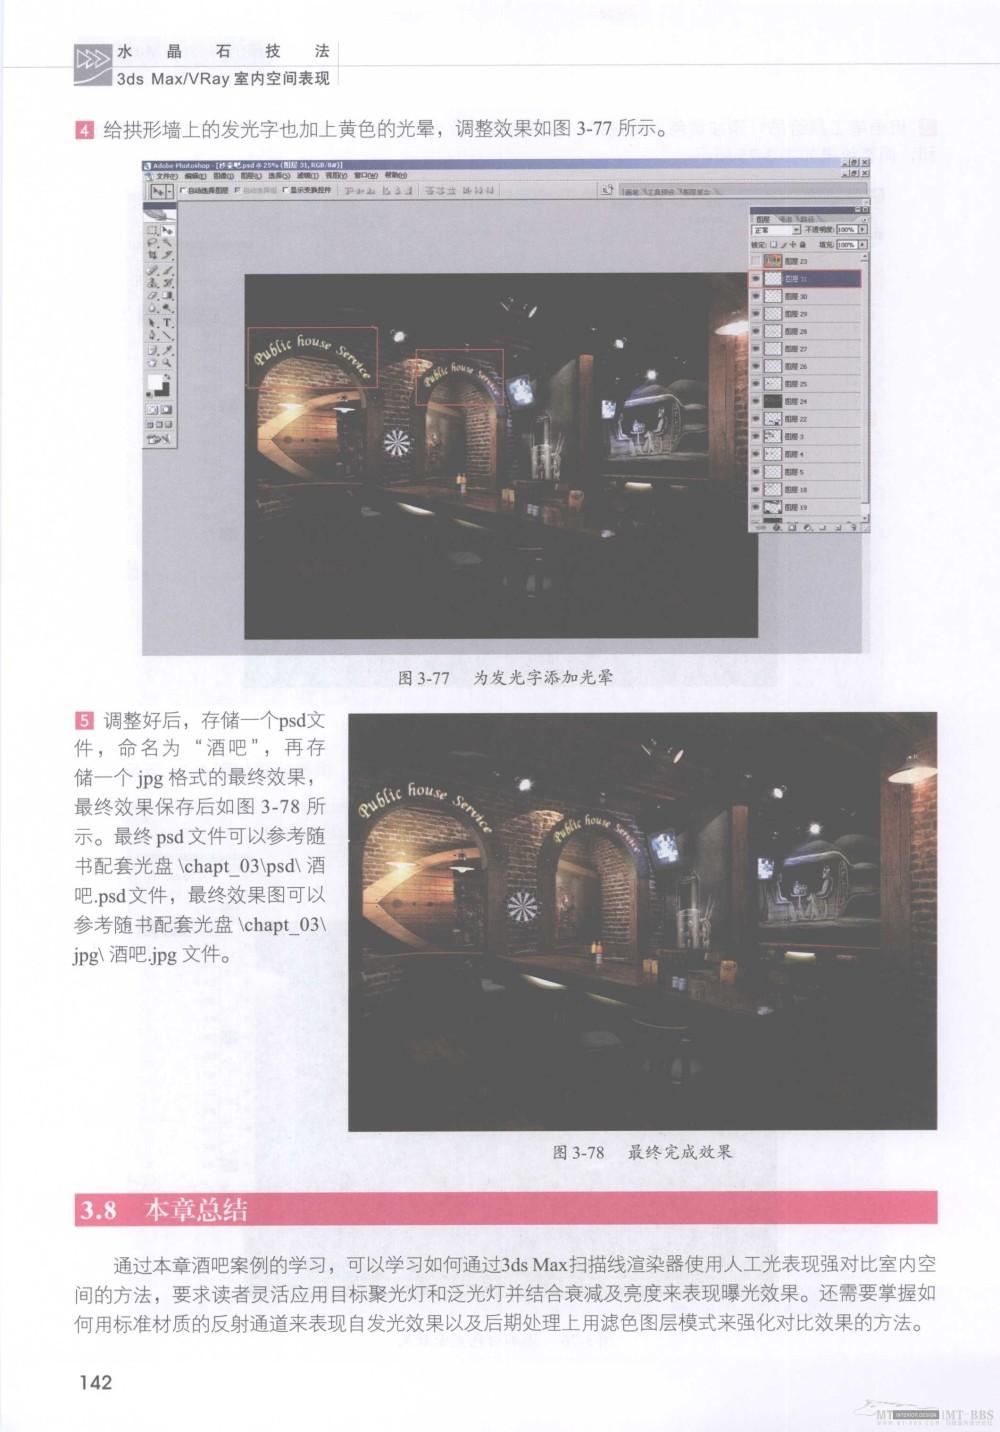 水晶石技法-3ds_Max&VRay室内空间表现_水晶石技法-3ds_Max&VRay室内空间表现_页面_148.jpg